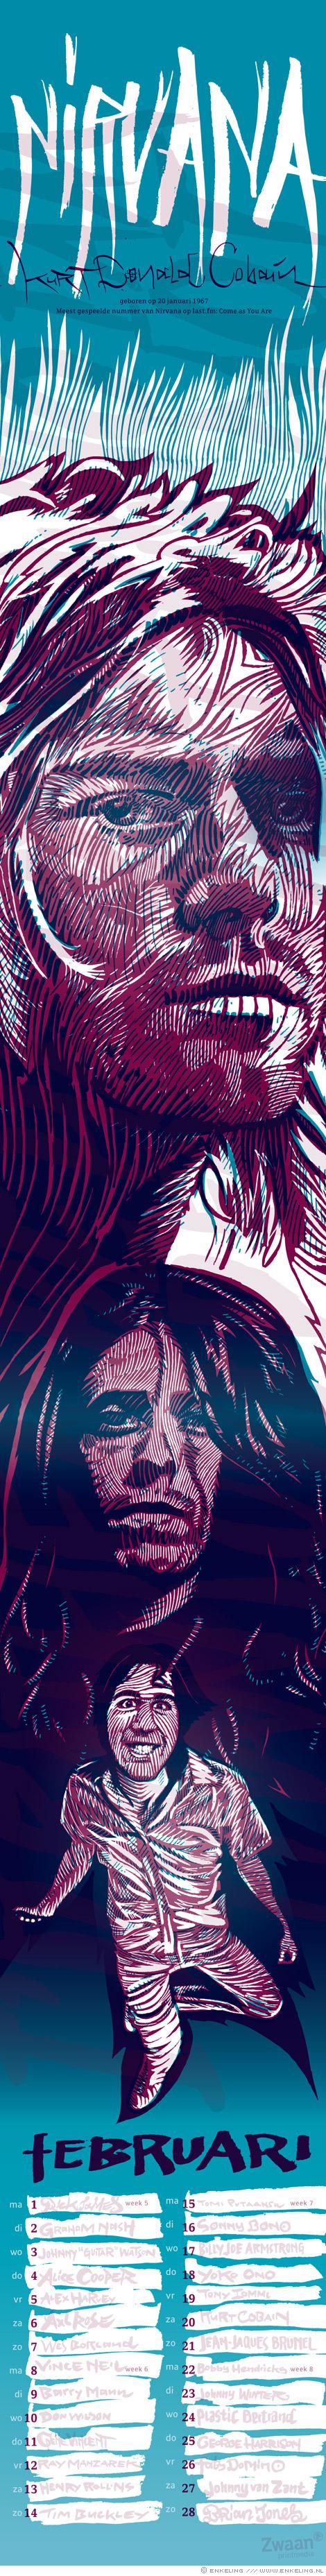 Kurt Cobain, Dave Grohl, Krist Novoselic, Nirvana, portraits, typography, calendar, Zwaan, Enkeling, 2010